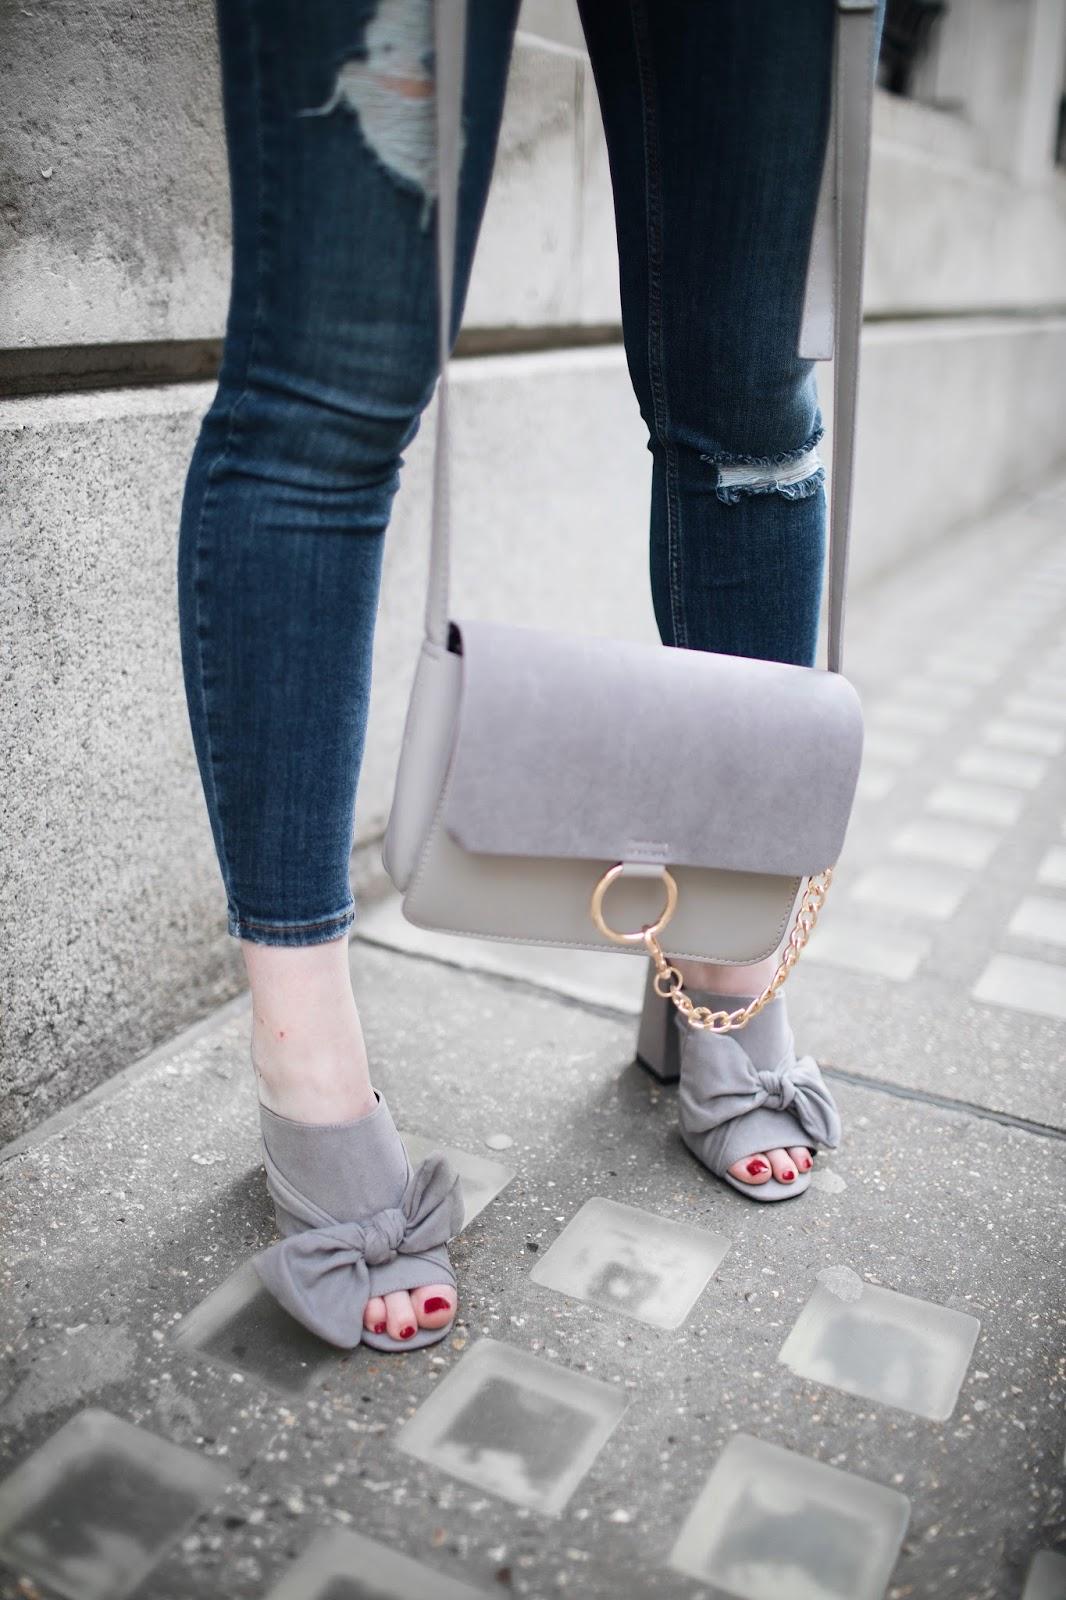 """color of the year 2017, 2017 dulux colour, denim drift colour, denim drift, 2017 fashion colour, london based petite fashion blogger, fashion blog, style blog, petite style blog, london based style blog, england style blog, england fashion blog, england petite blog"